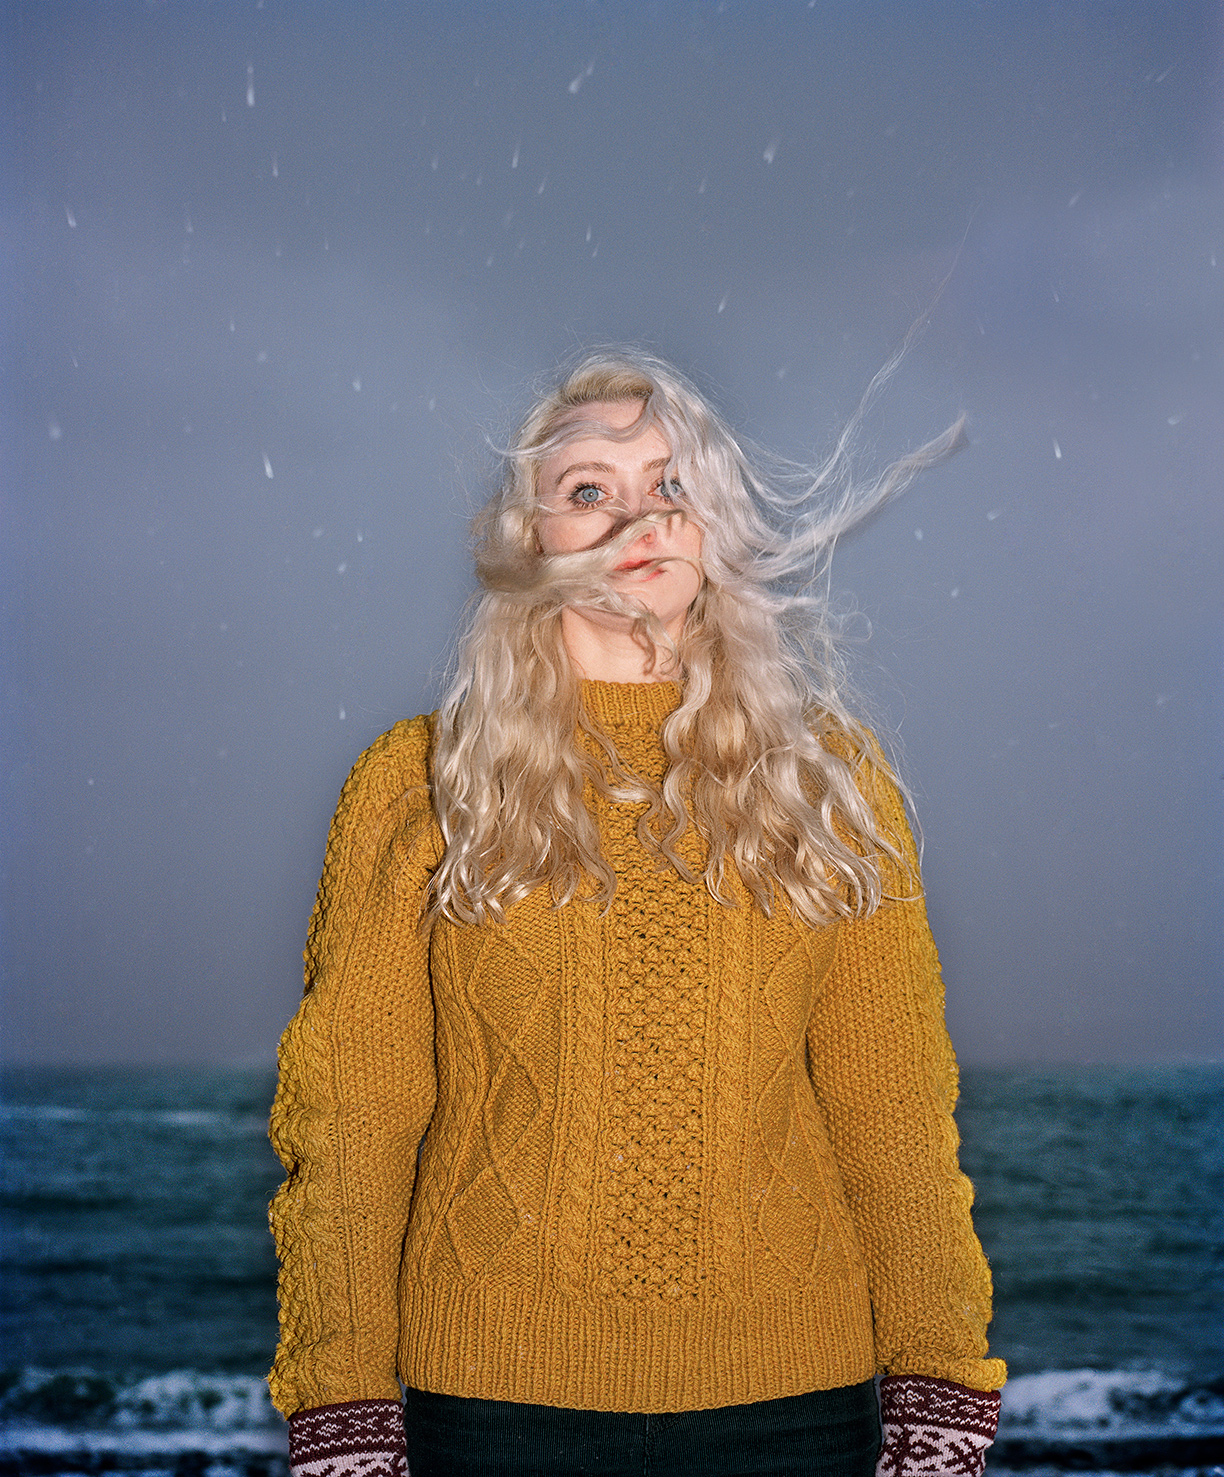 Greta in Storm